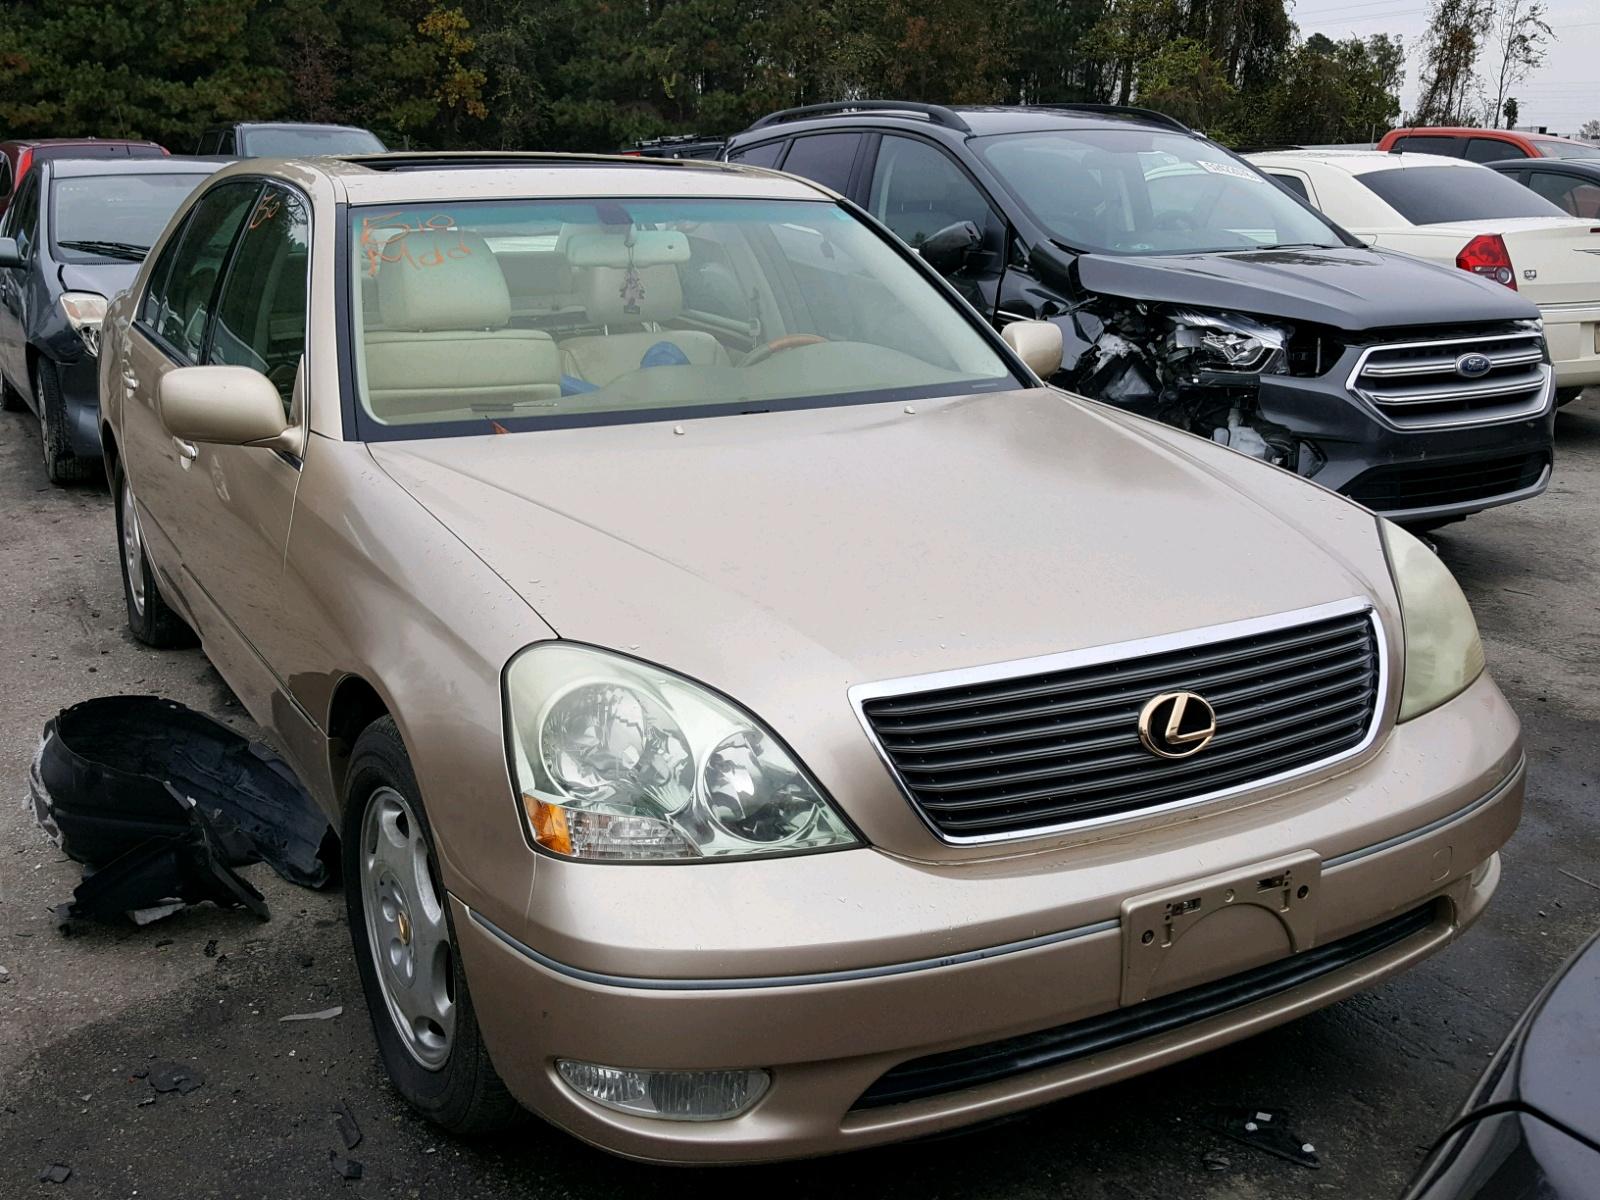 Salvage 2001 Lexus LS 430 for sale